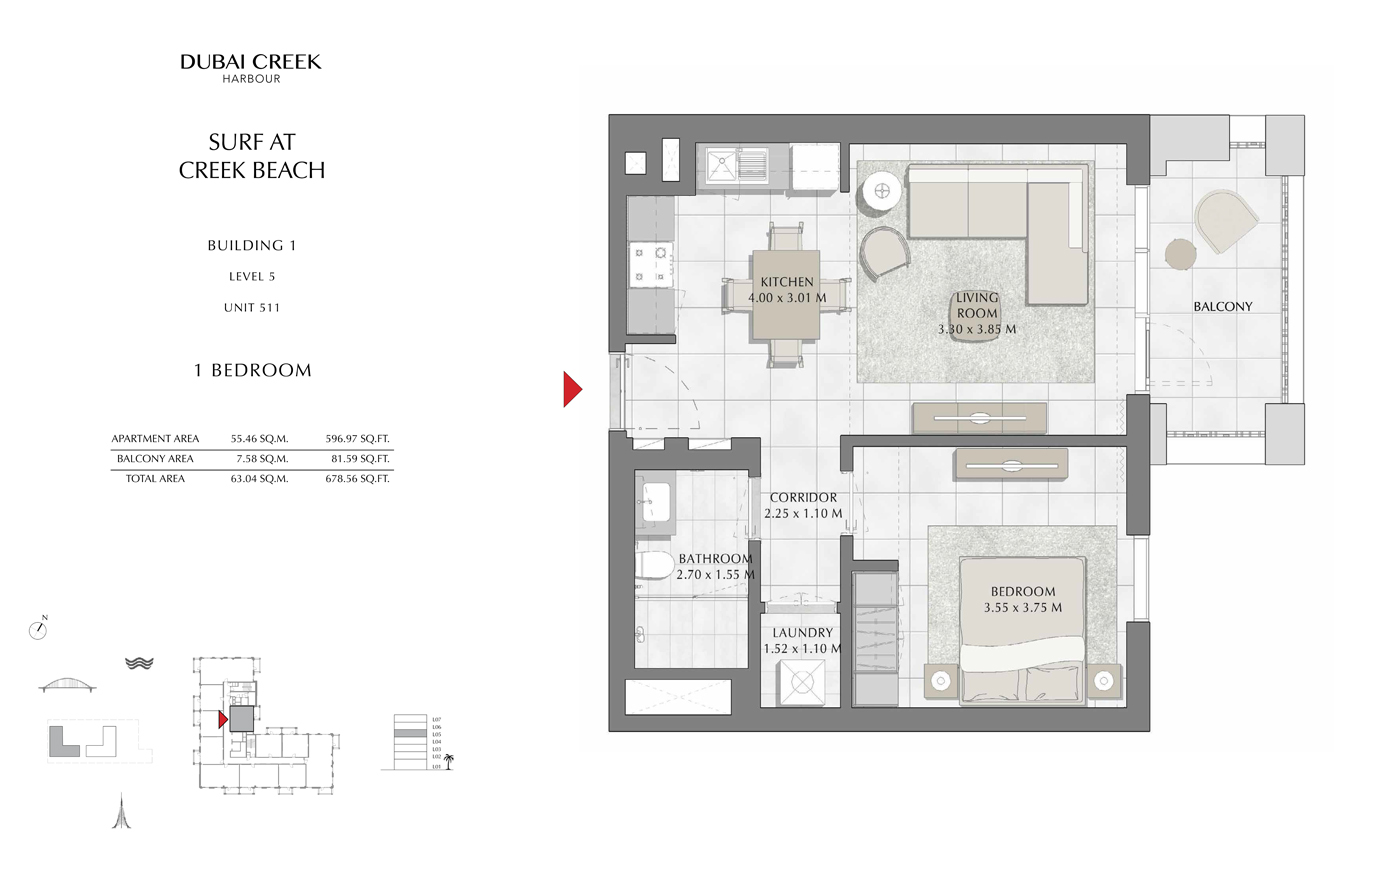 Building 1, 1 Bedroom, Level 5, Unit 511, Size 678 Sq Ft